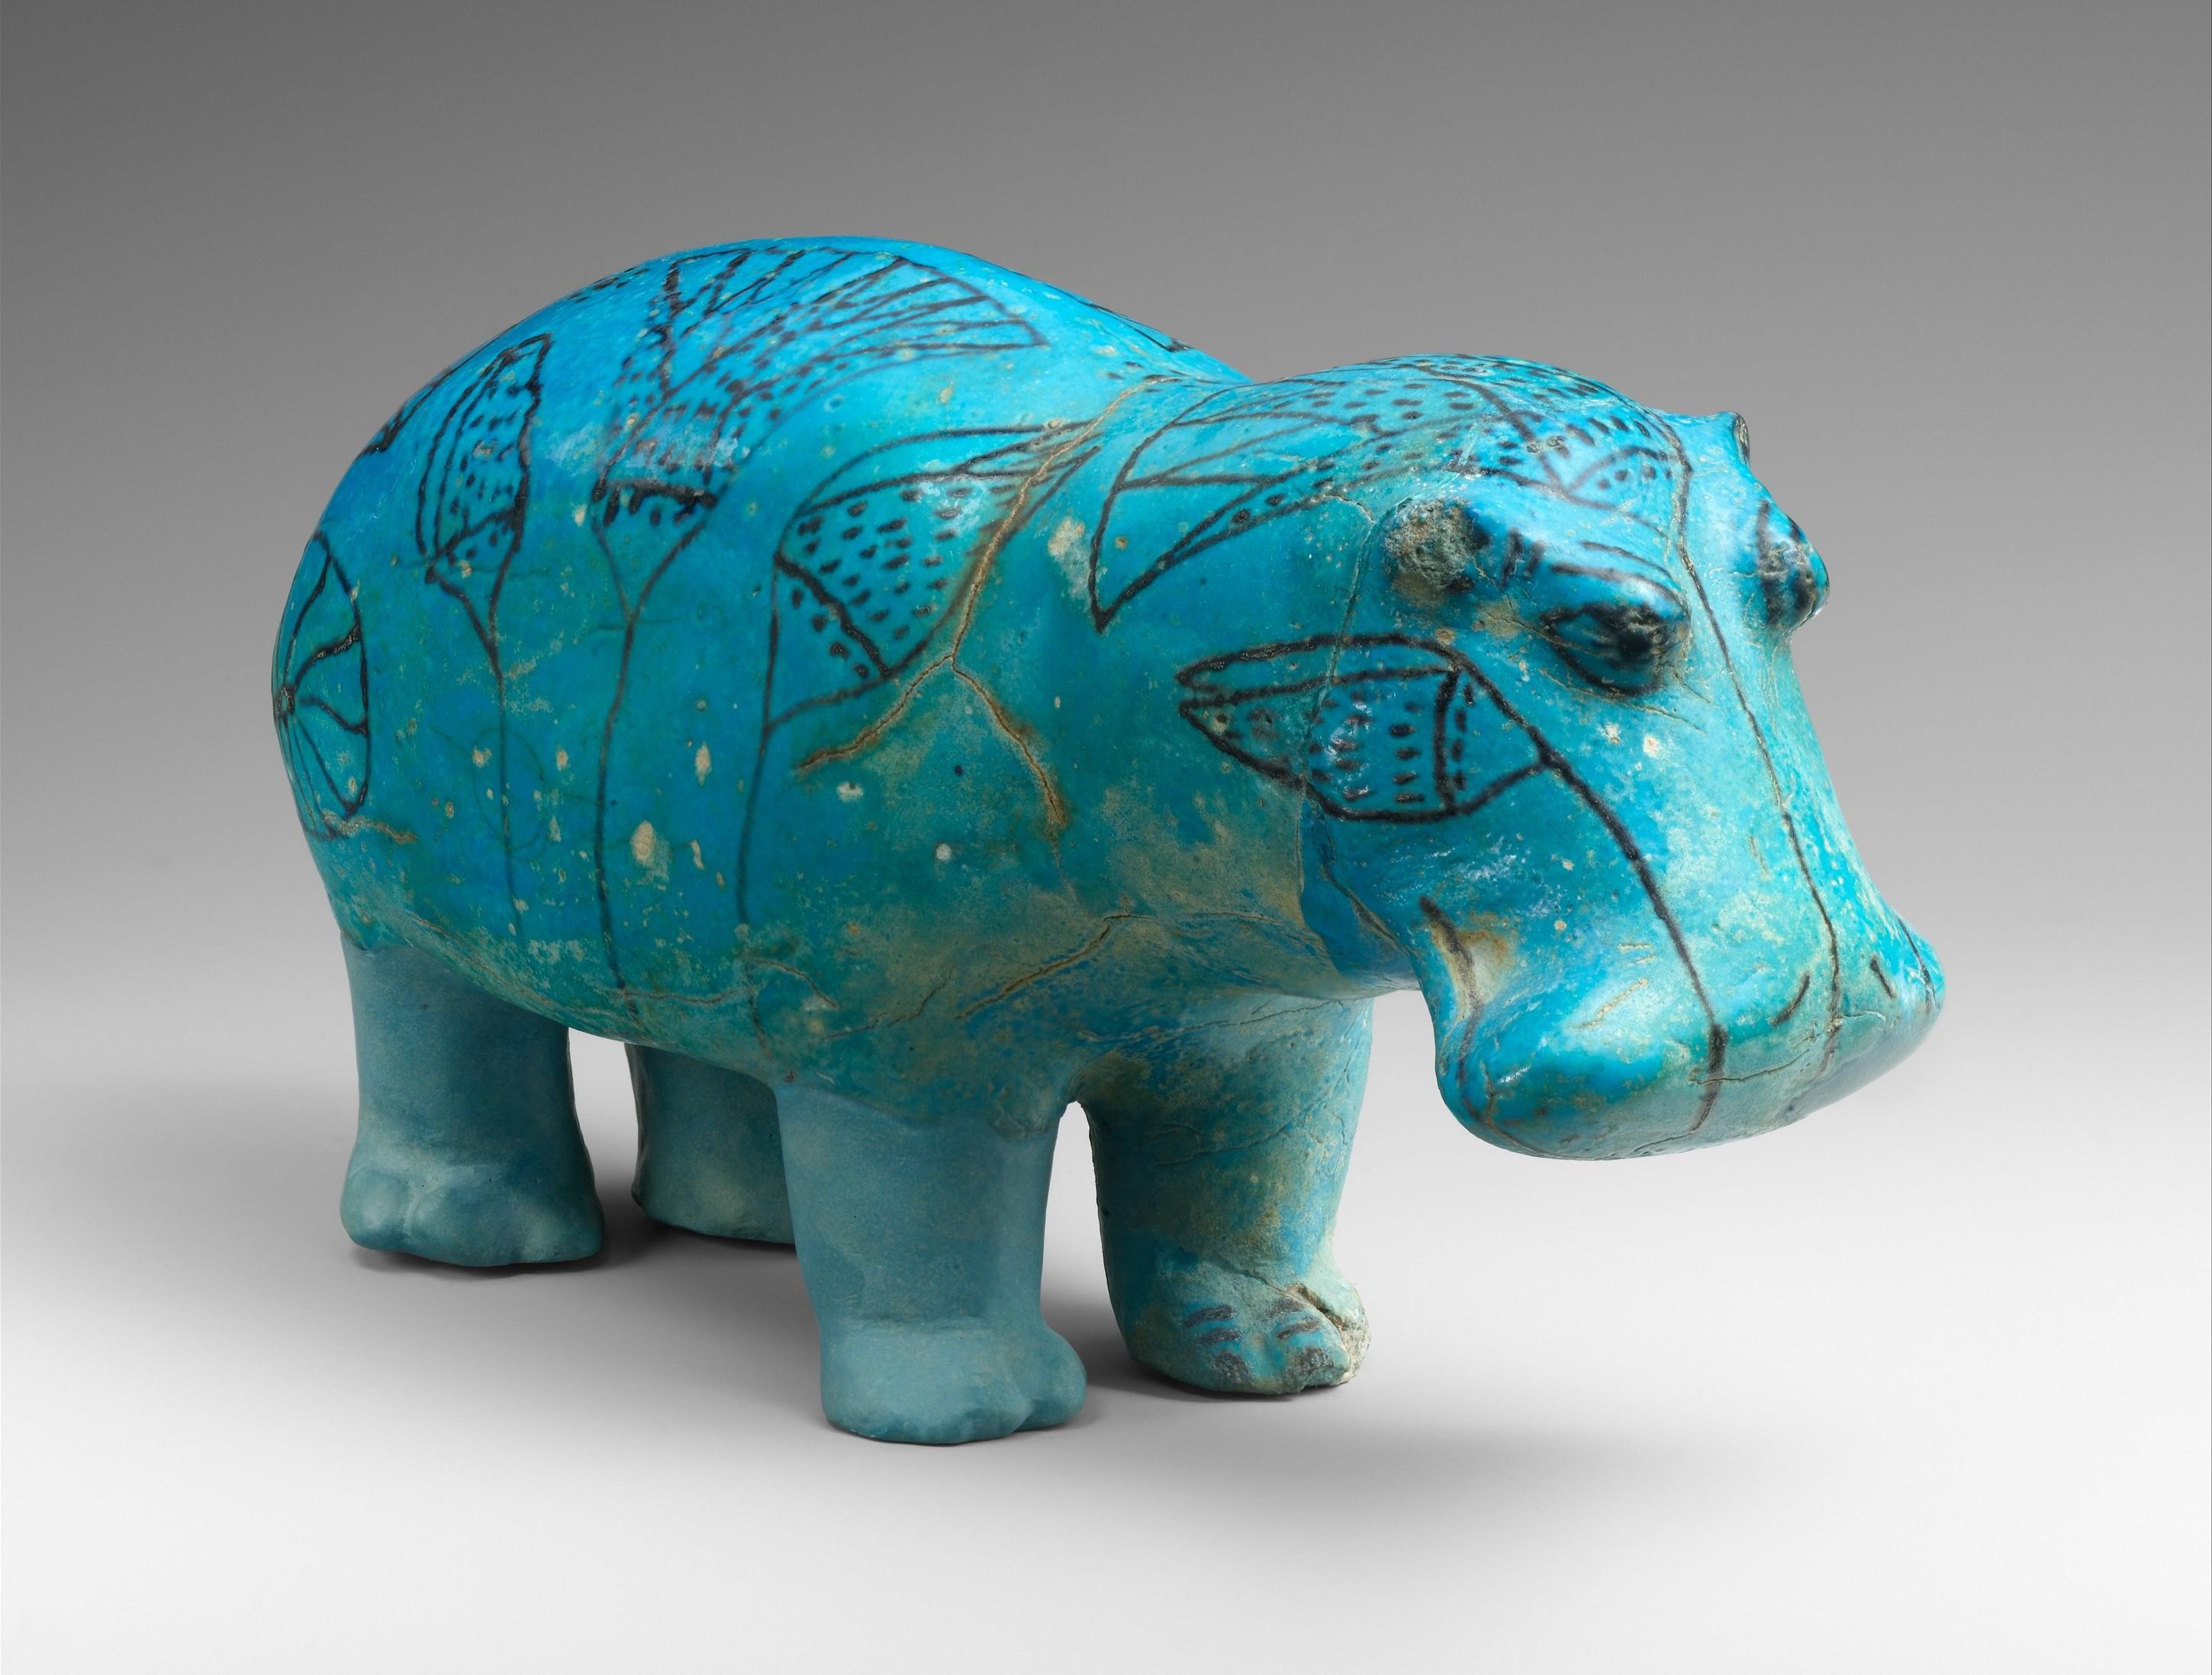 William the Faience Hippopotamus - Wikipedia